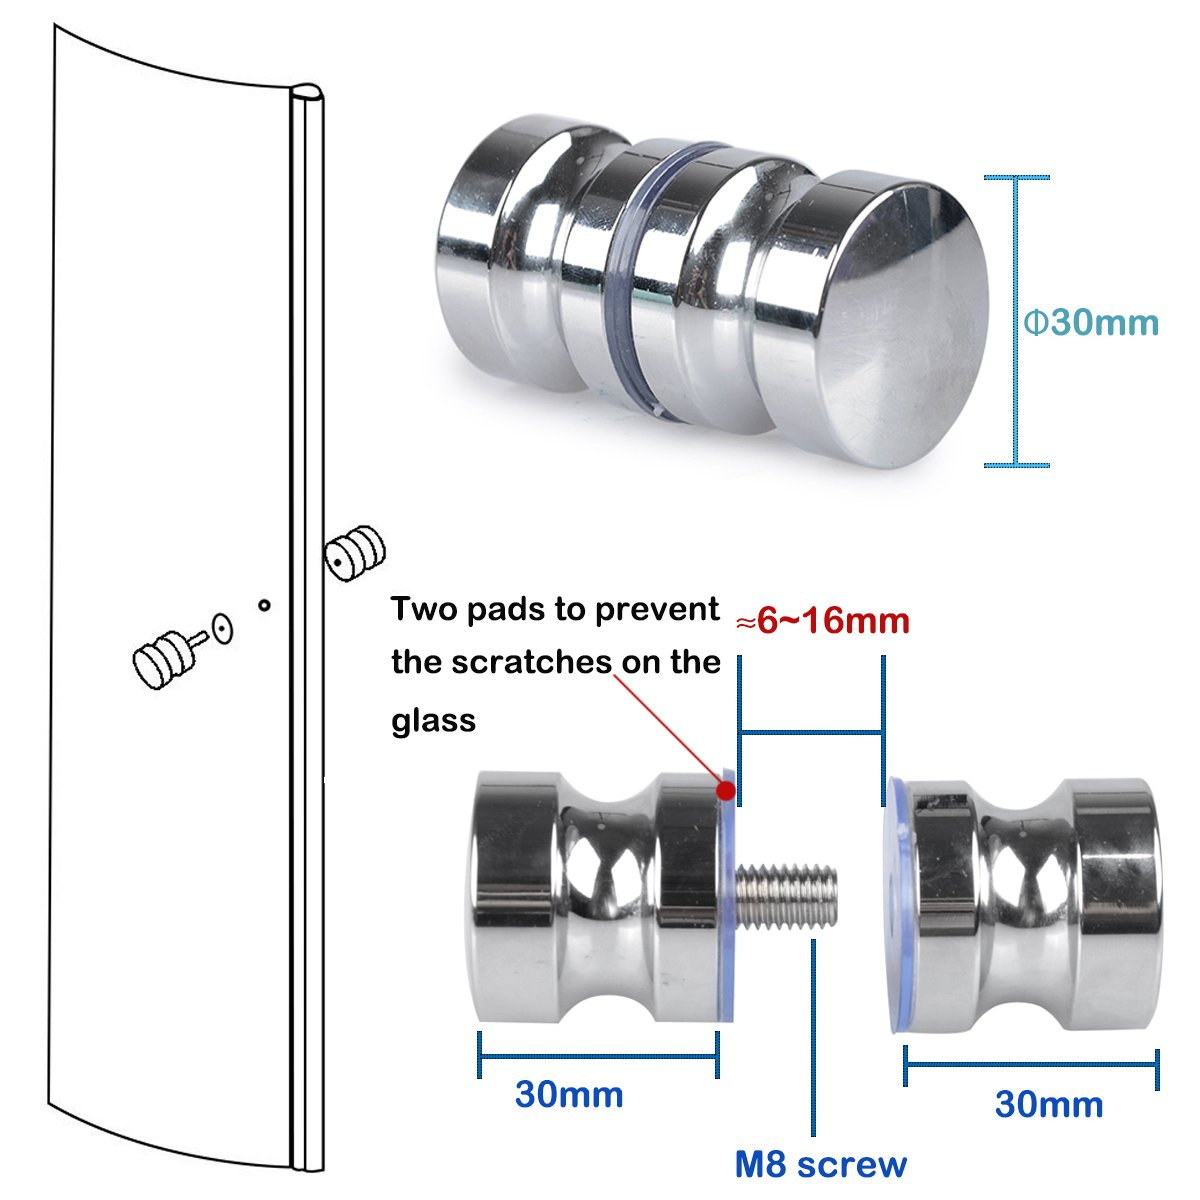 SHiZAK 2 poignées de porte de douche en acier inoxydable, rondes, poignée de porte de rechange chromée: Amazon.es: Bricolaje y herramientas